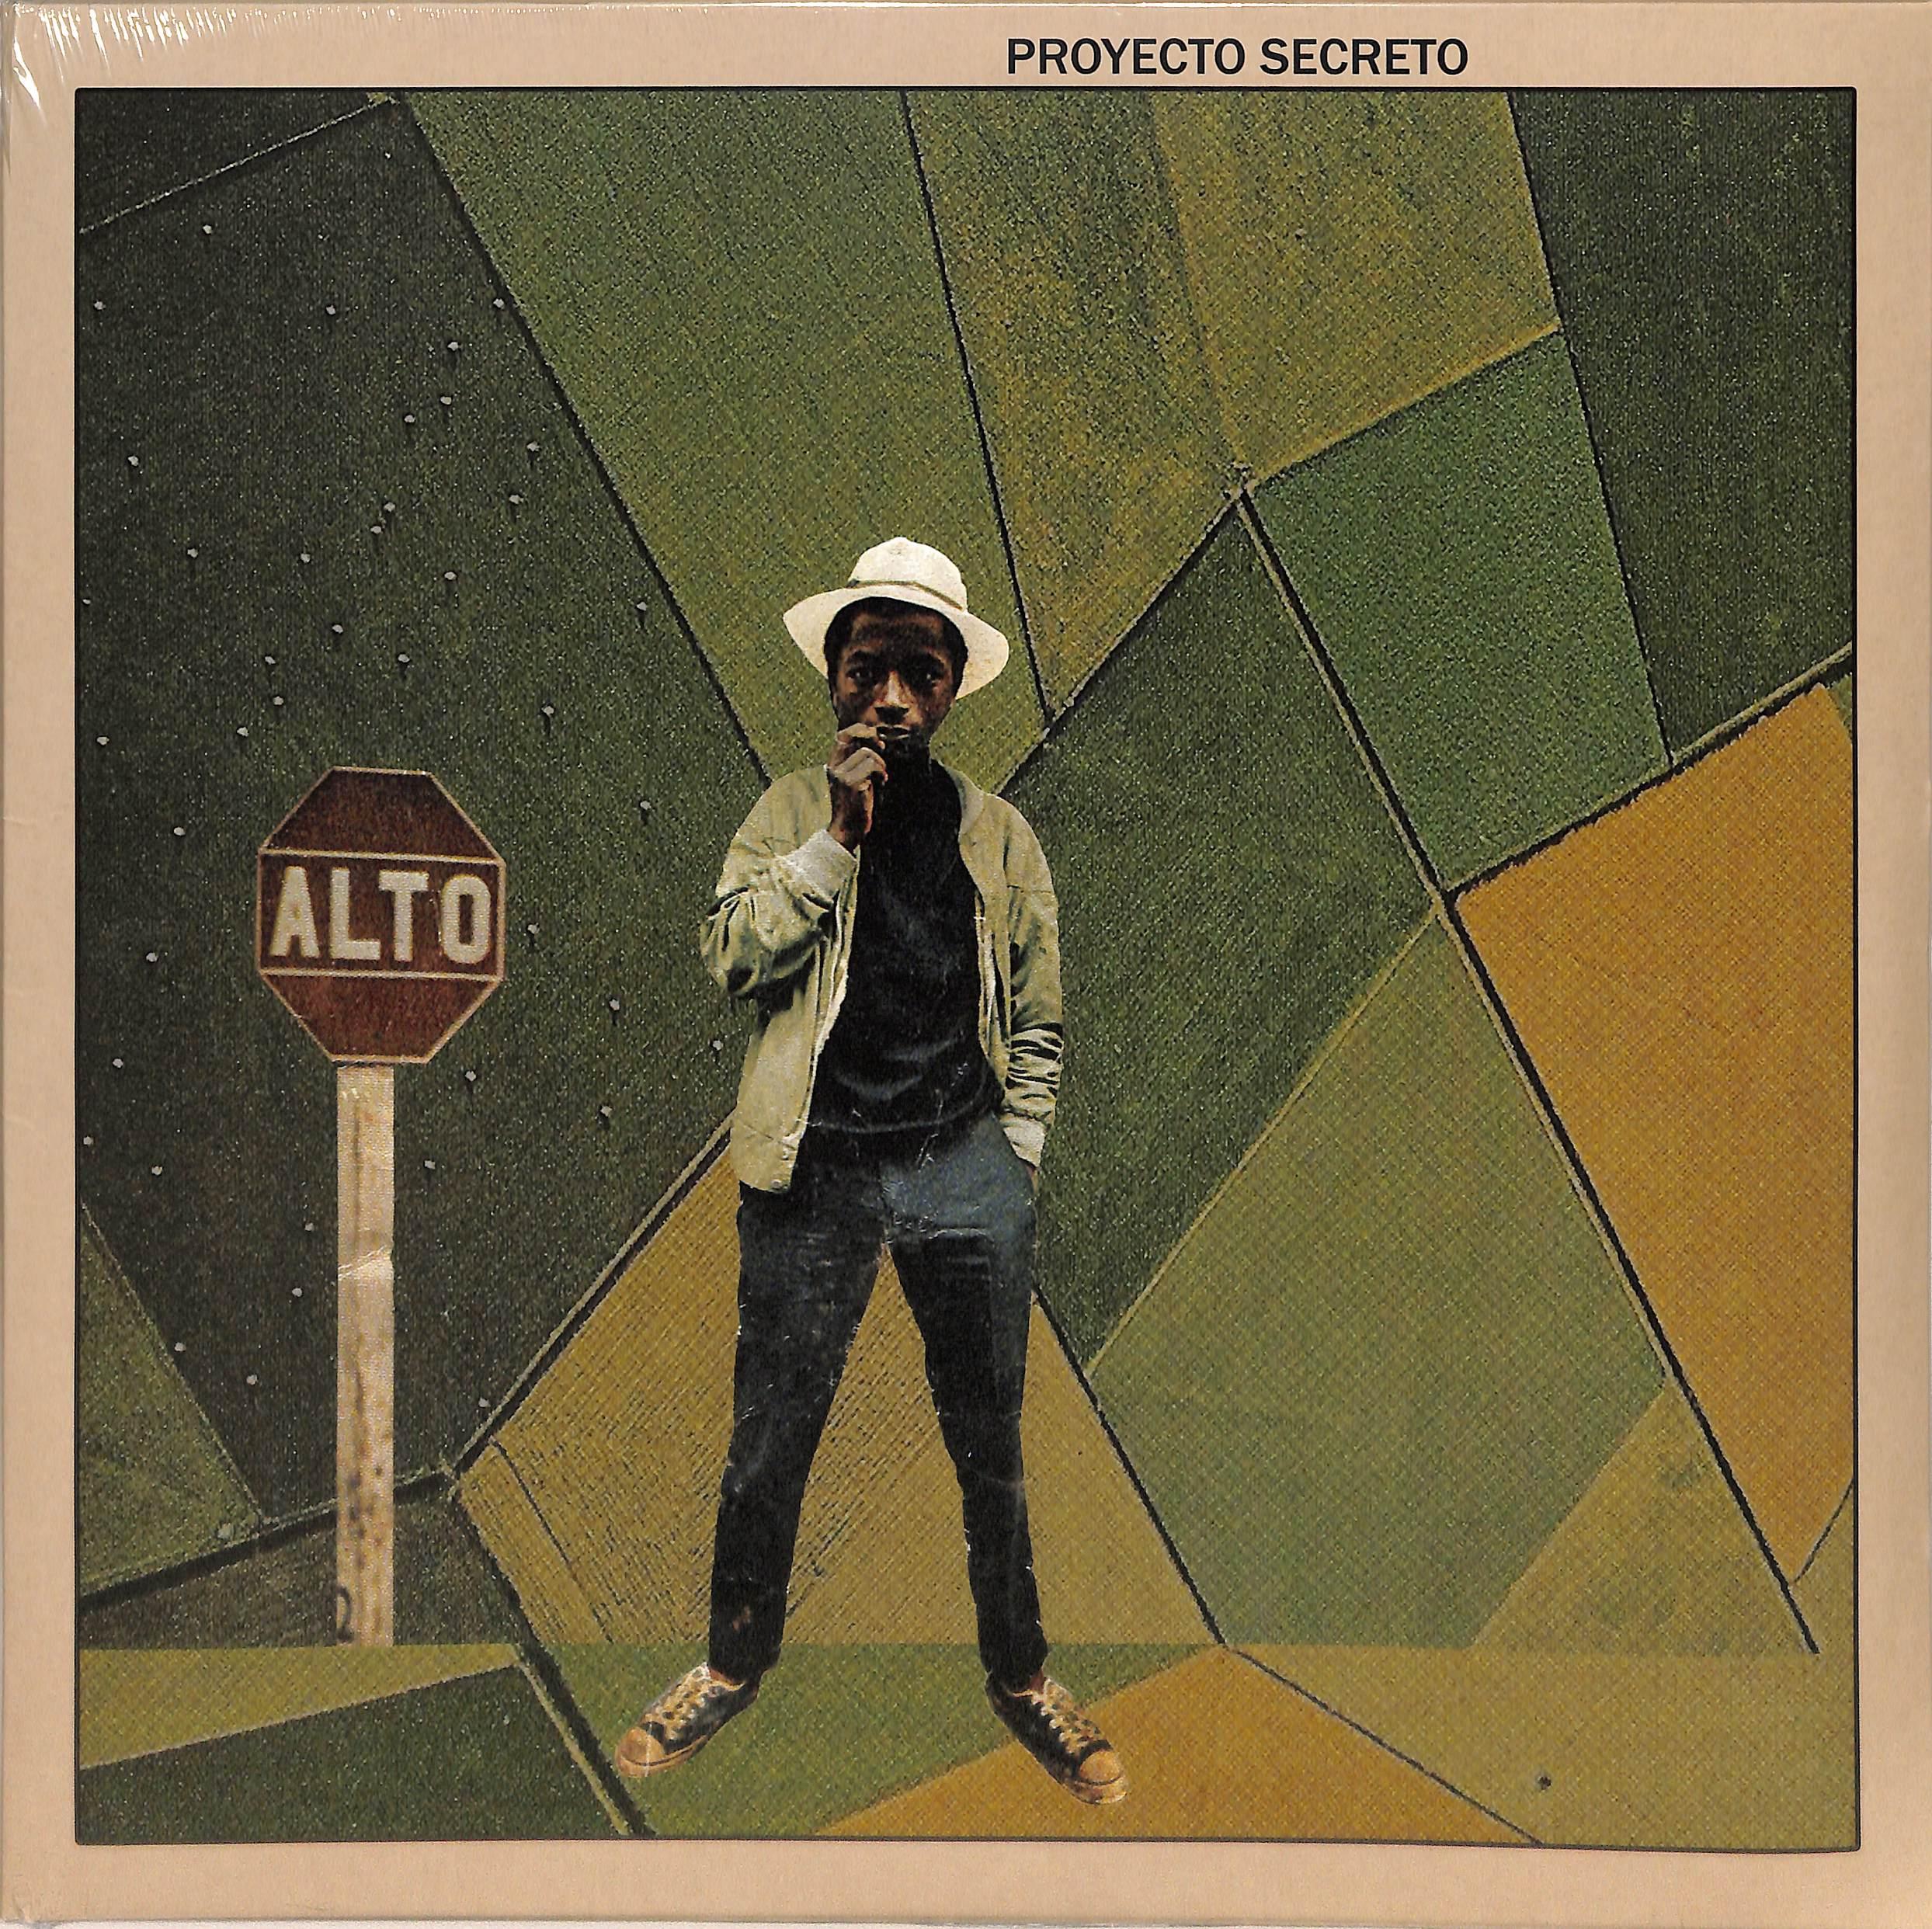 Proyecto Secreto - ALTO